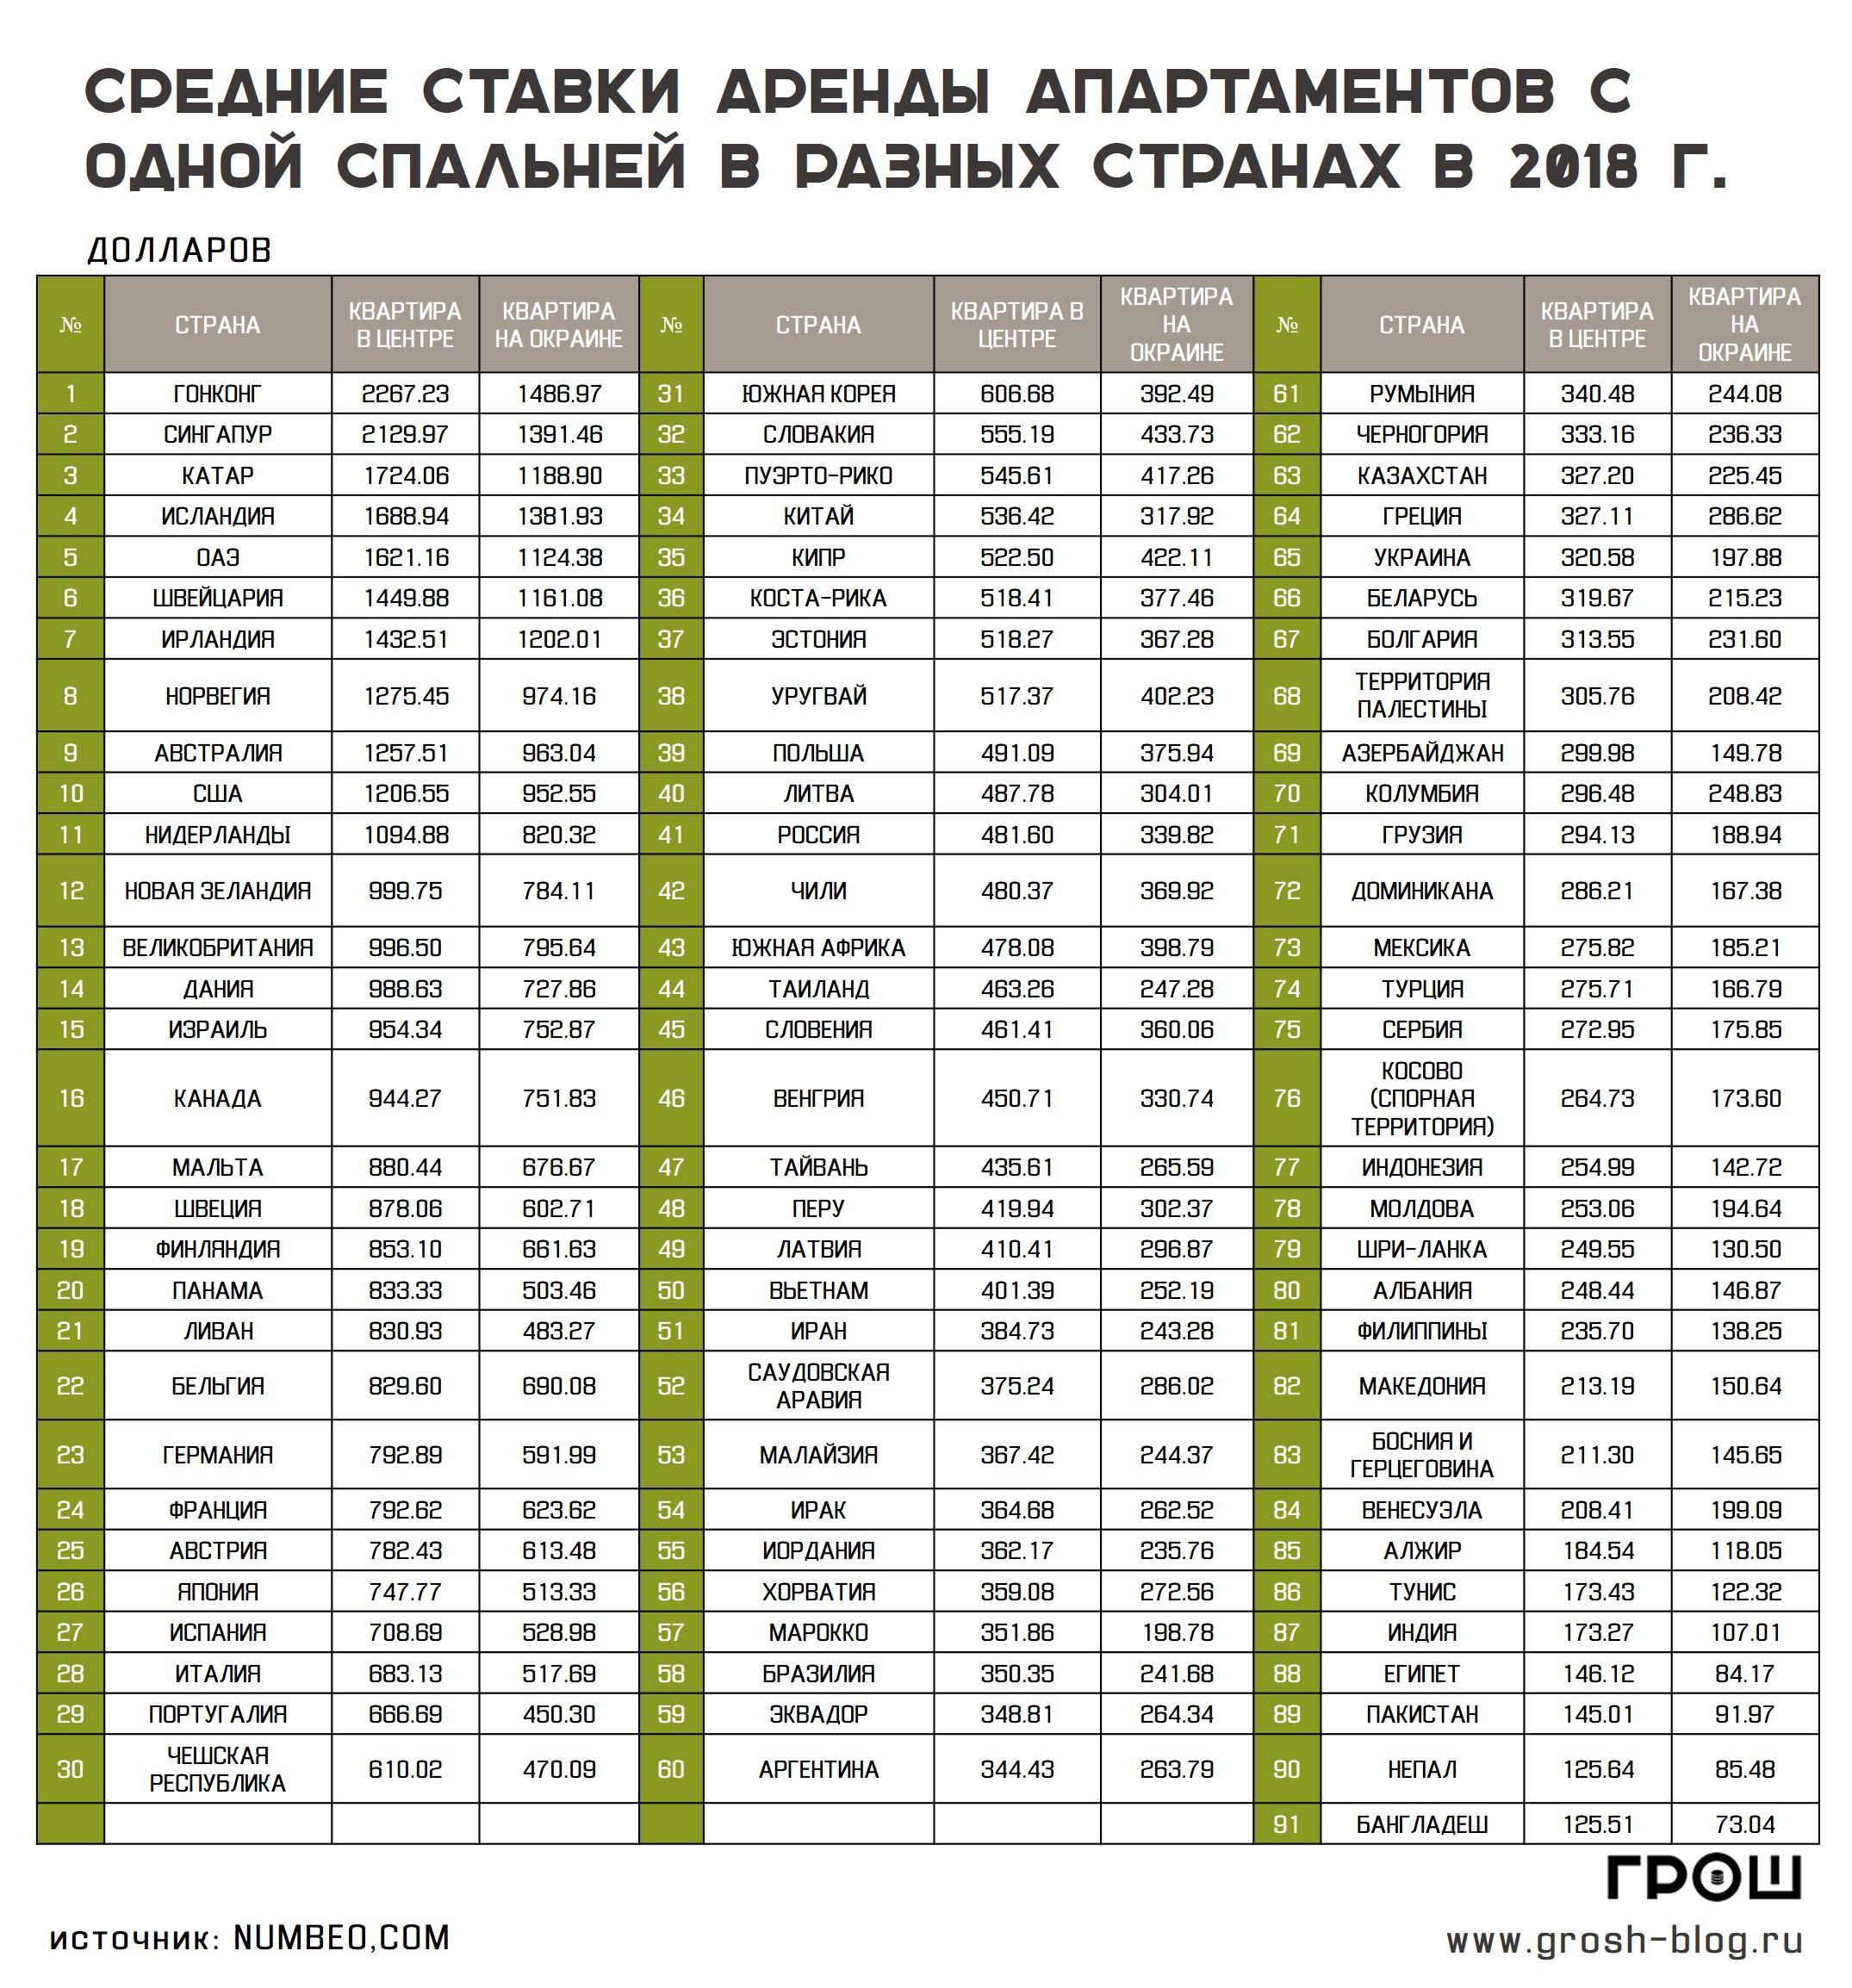 ставки аренды однокомнатных квартир в разных странах https://grosh-blog.ru